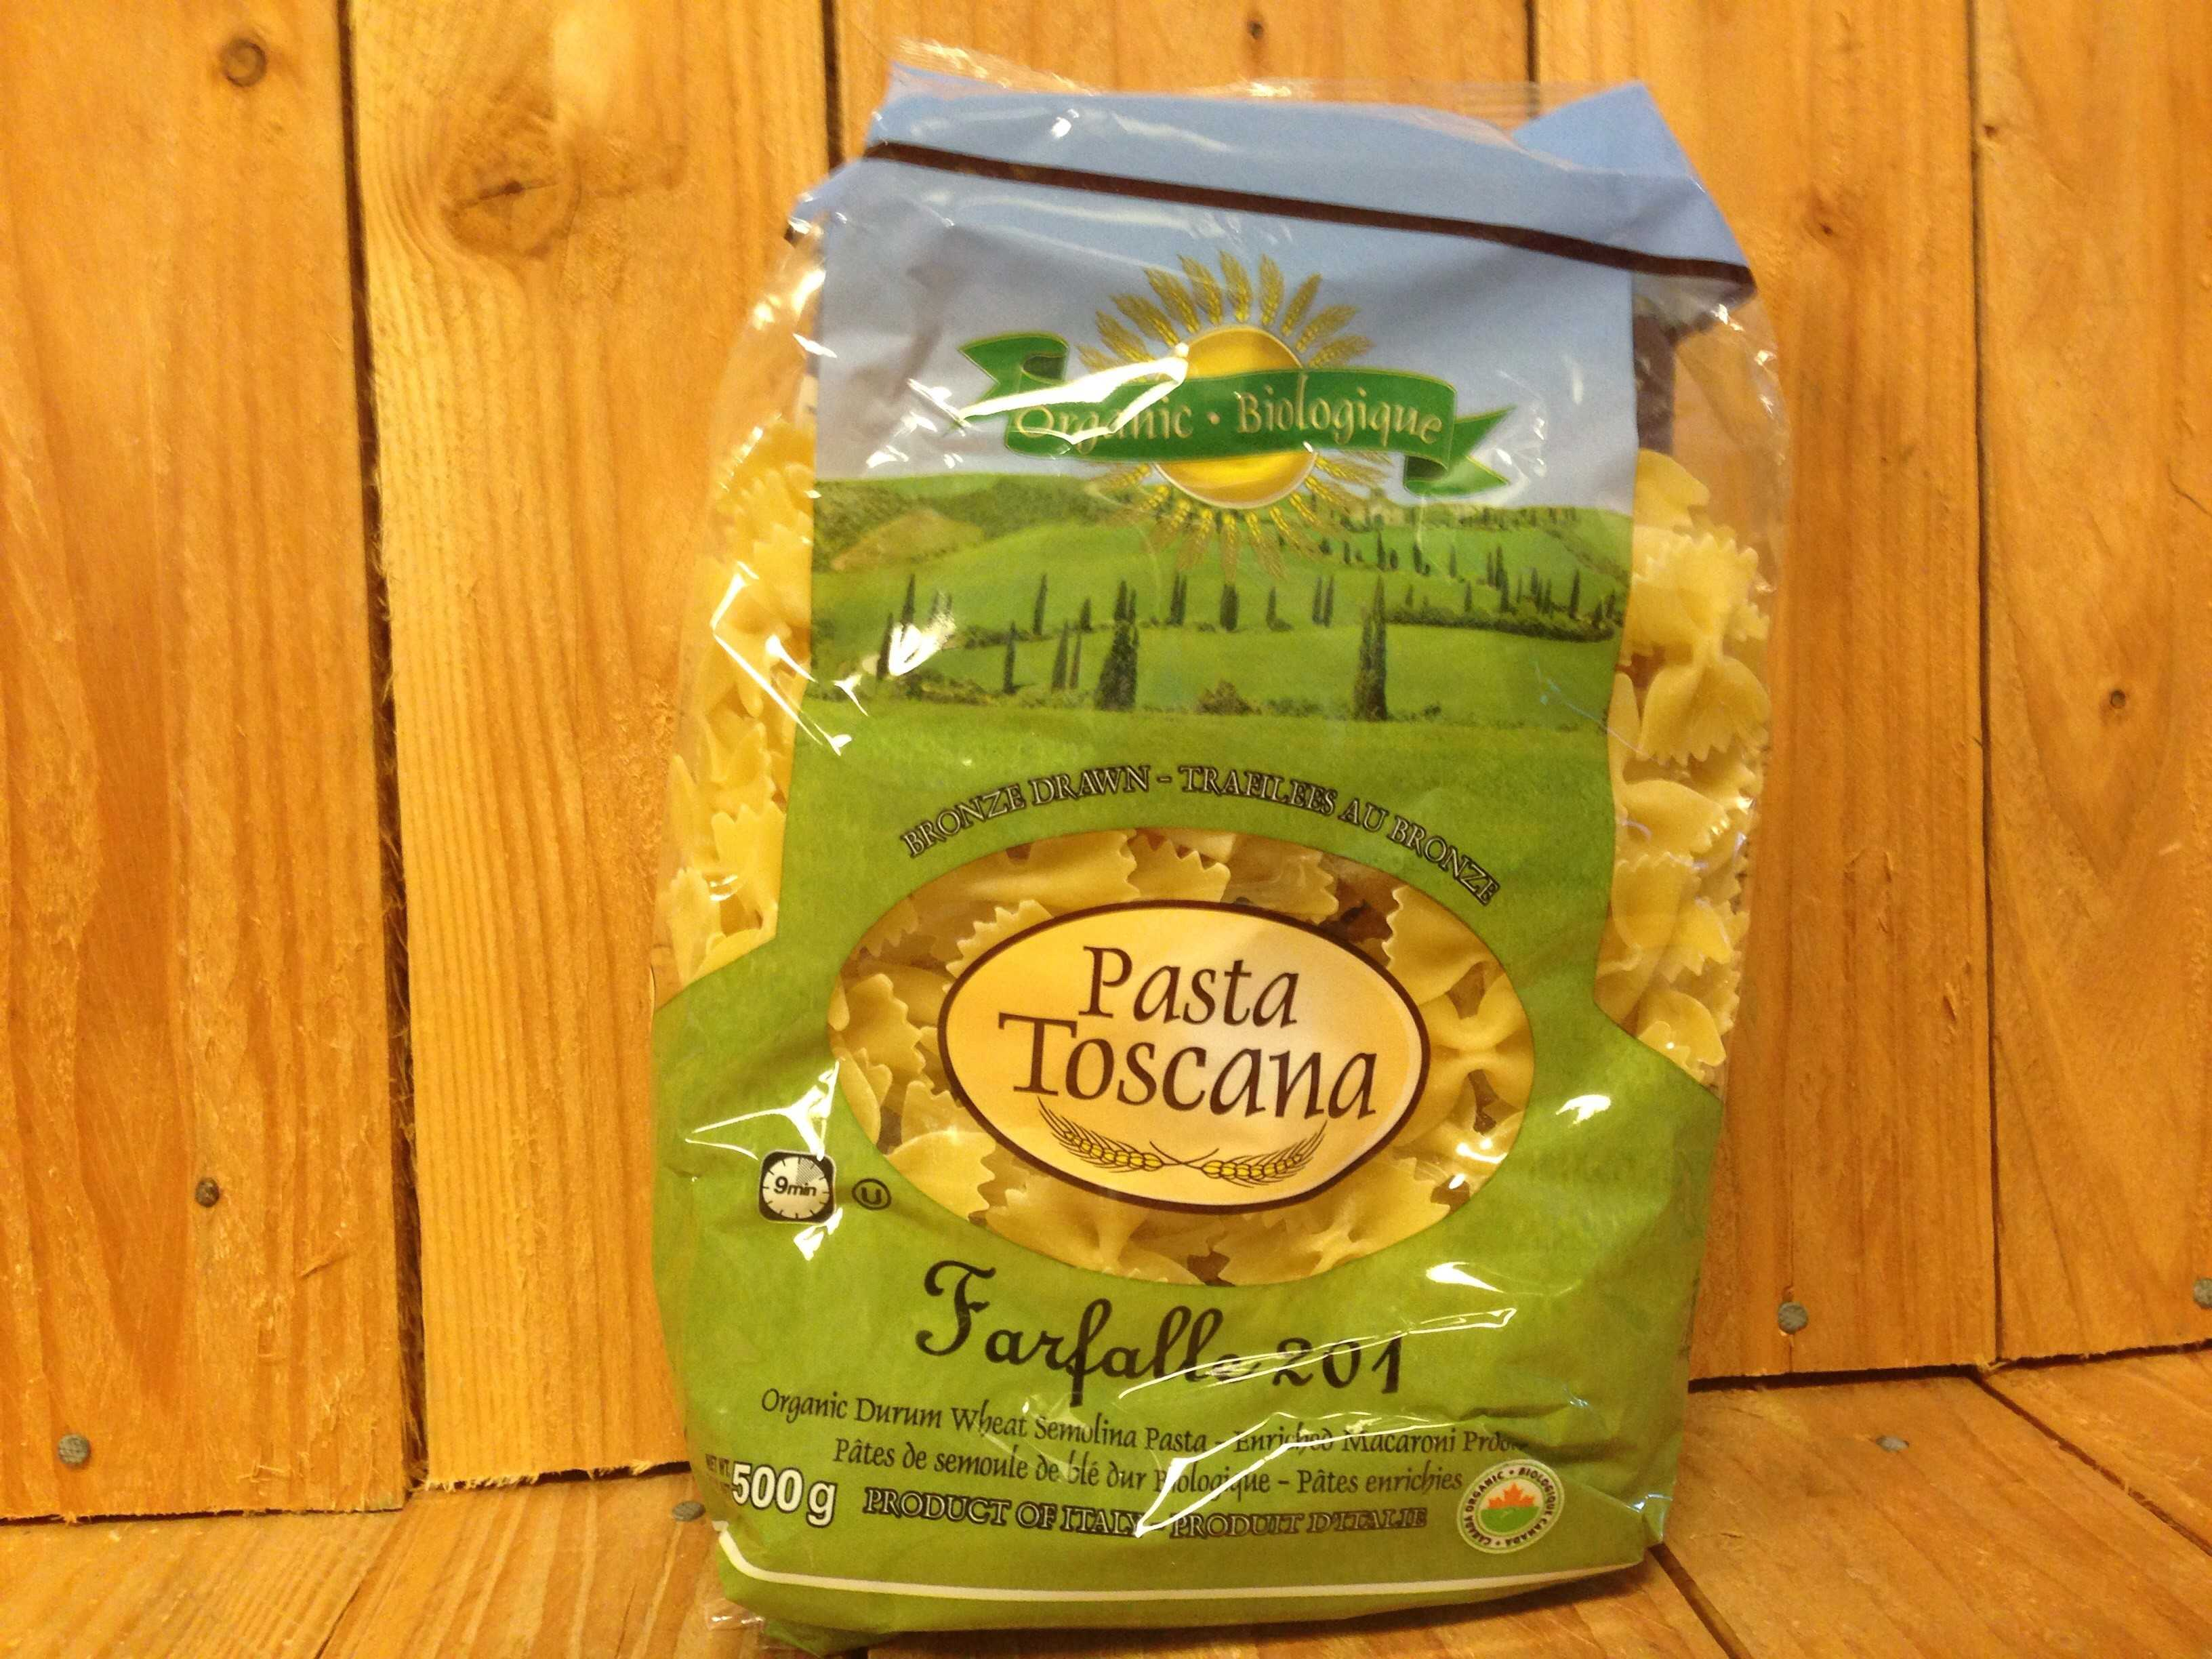 Pasta Toscana – Organic Farfalle – Durum Wheat (500g Bag)